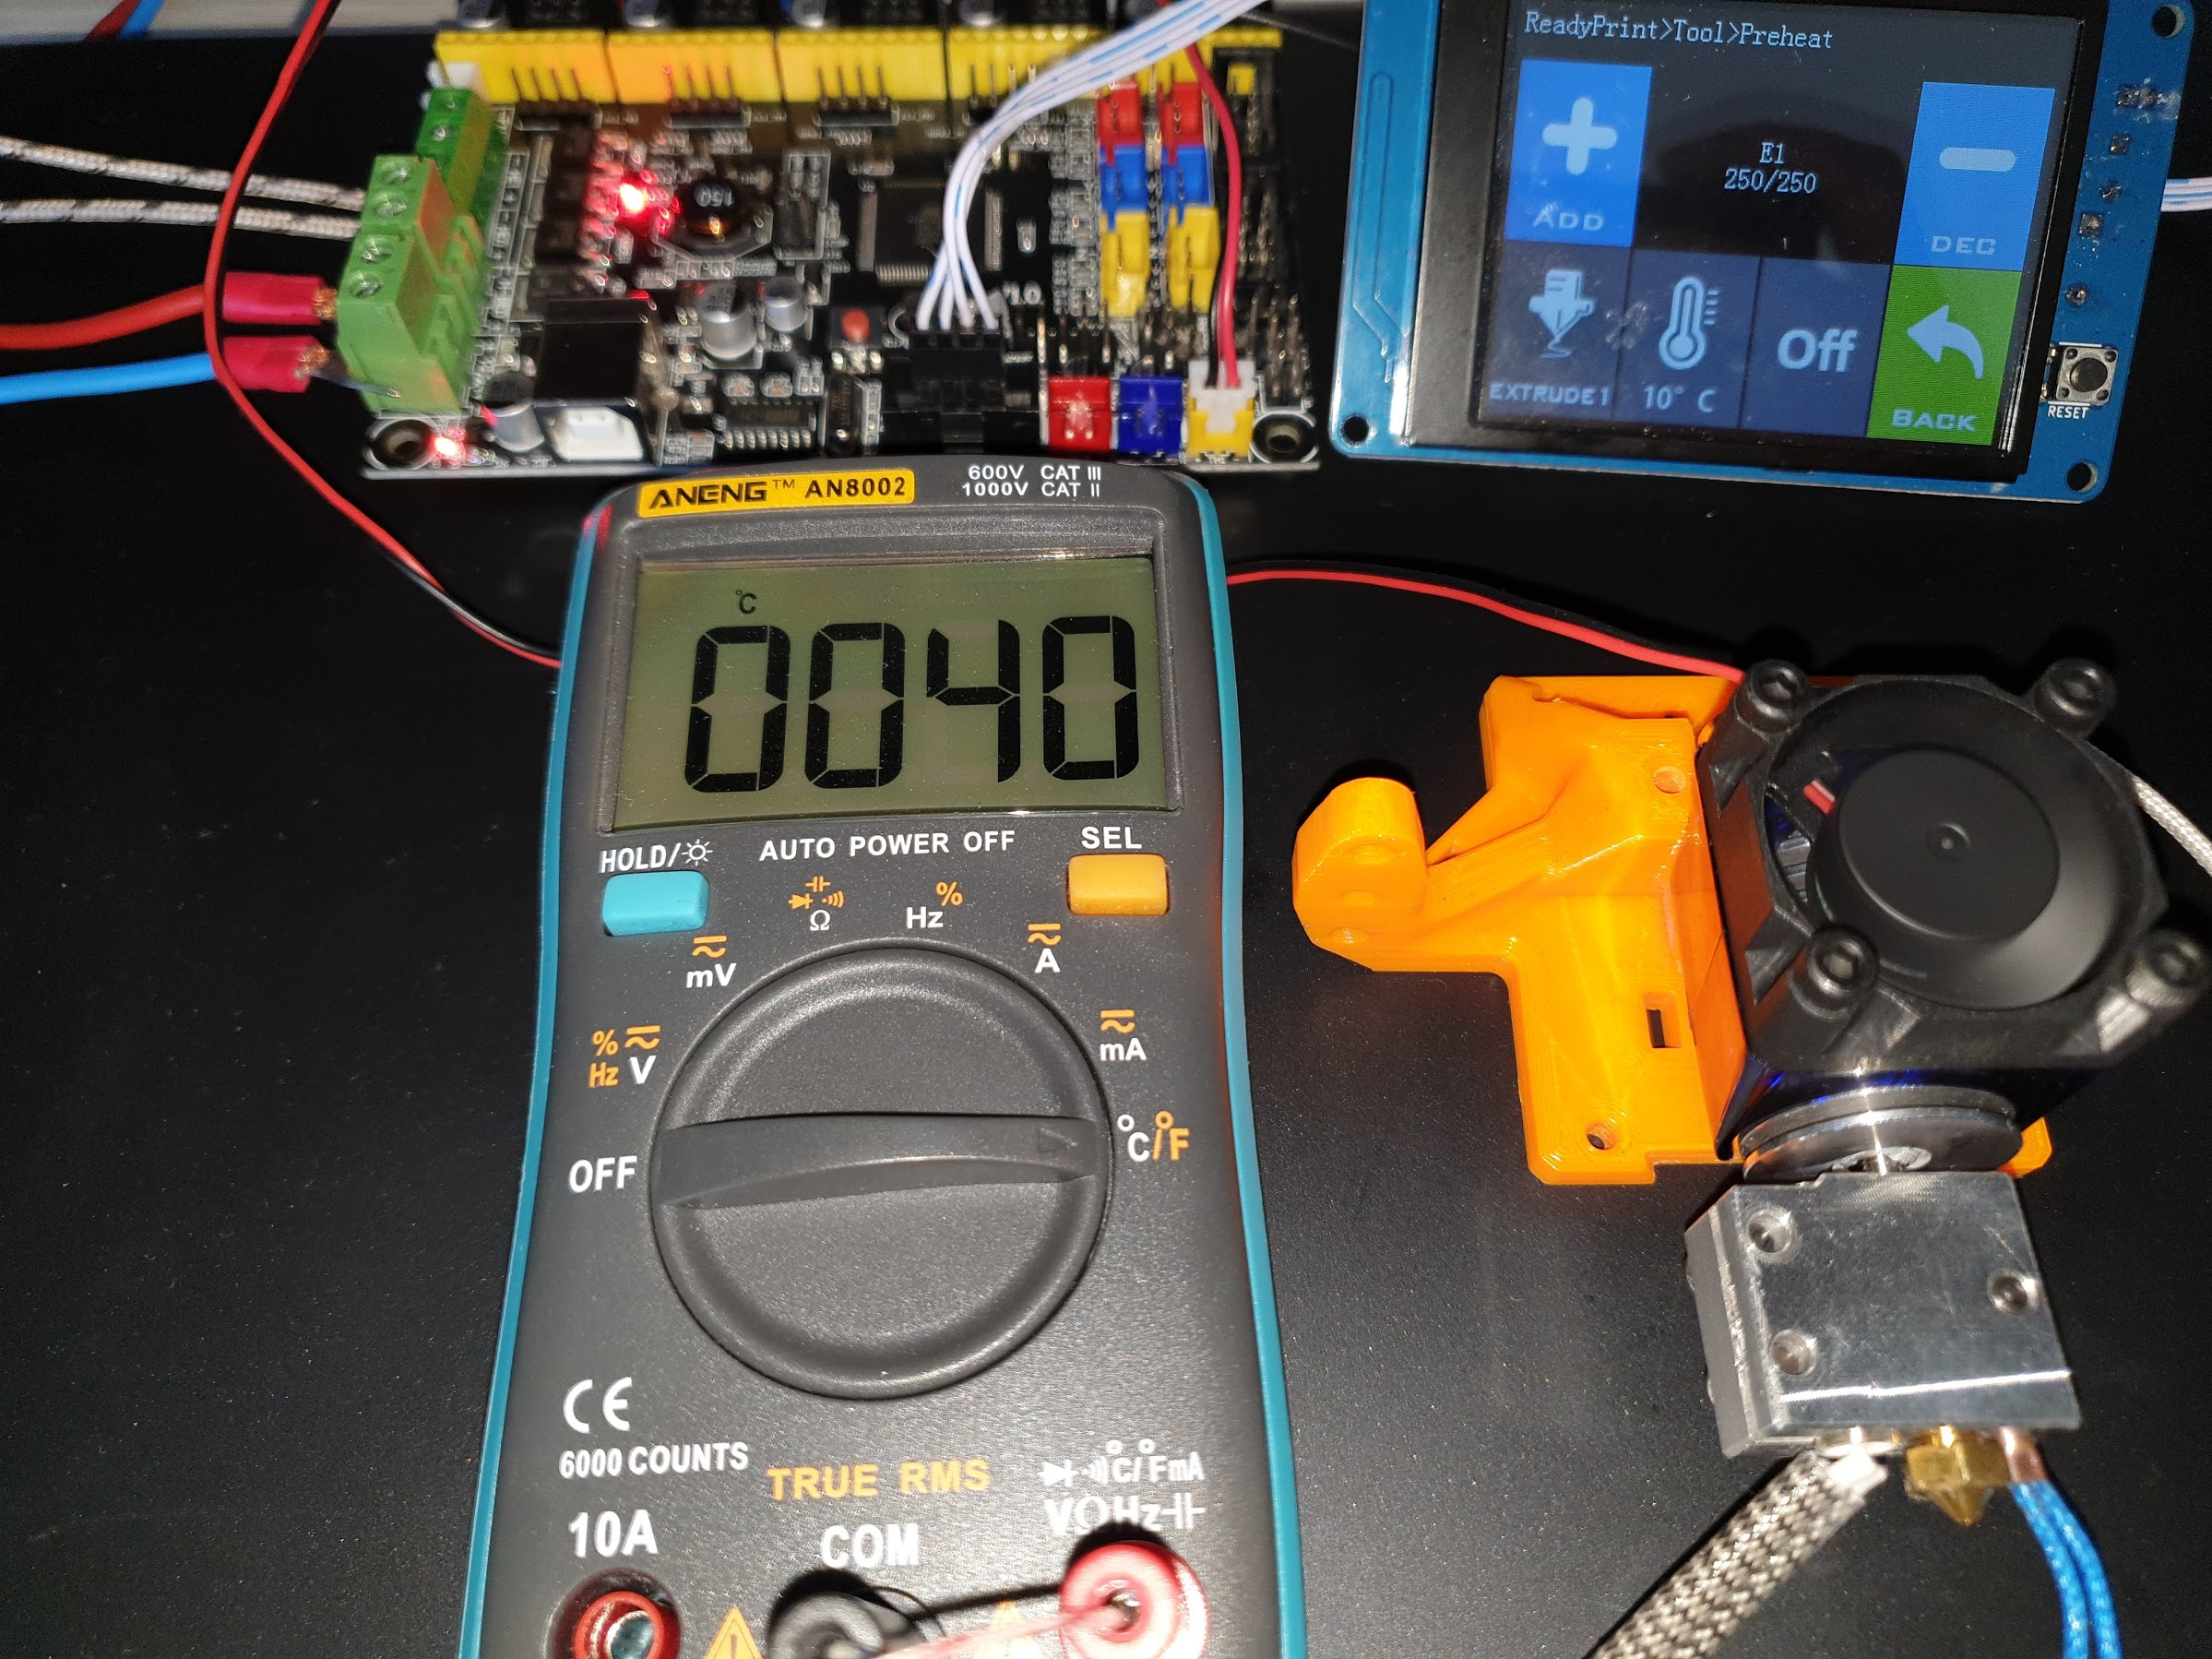 250C Regular Metal V6 Heatsink 10 minutes 40C